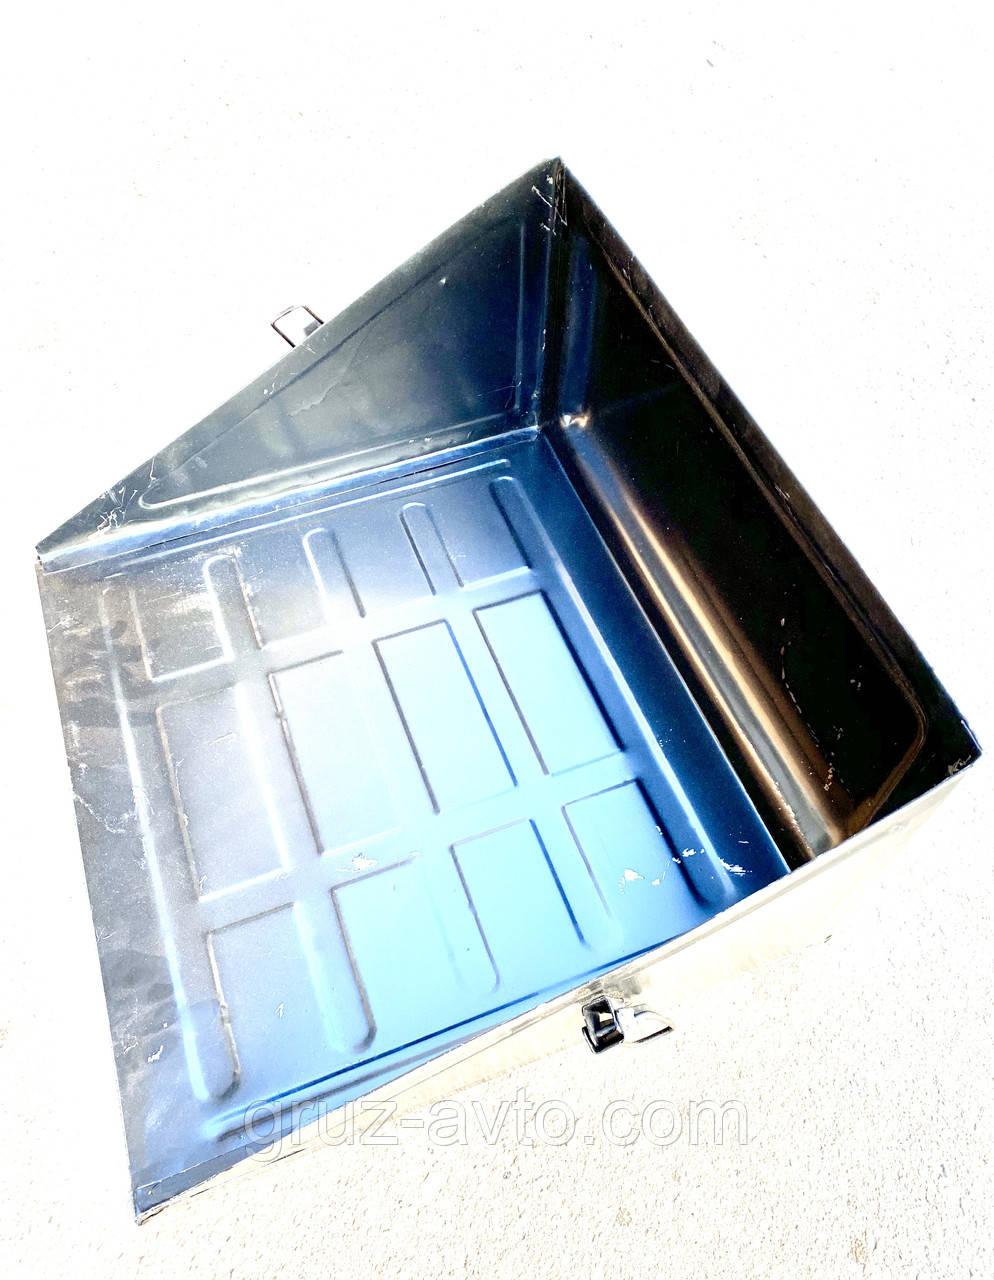 Крышка гнезда аккумуляторной батареи КамАЗ 5320 (пр-во КАМАЗ) металл на защелках/5320-3703158